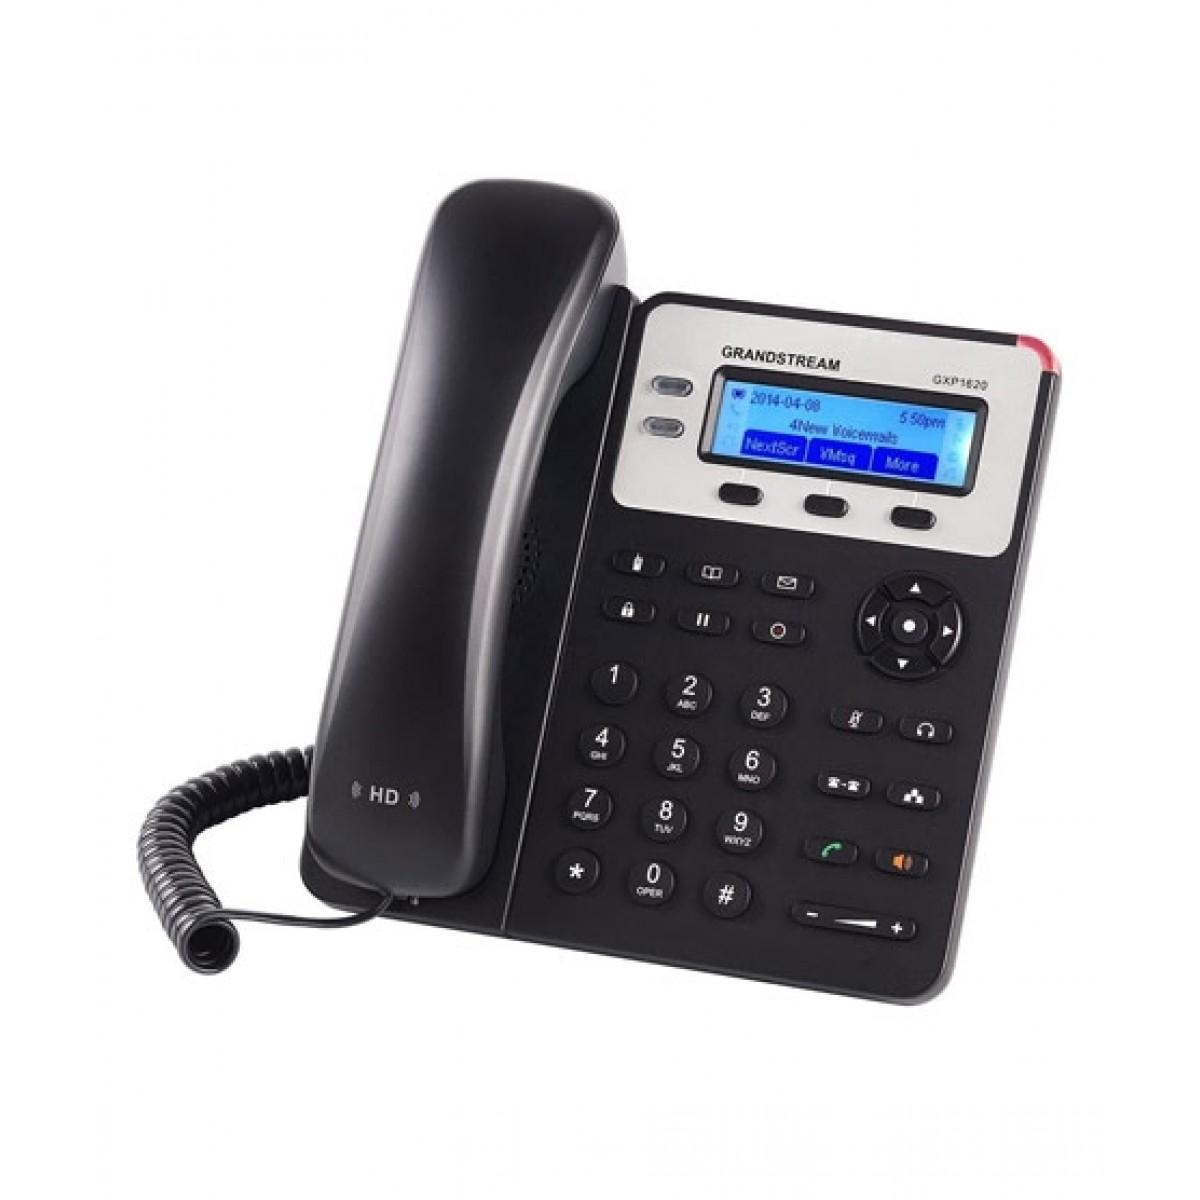 Grandstream VoIP Landline Telephone (GXP1625)